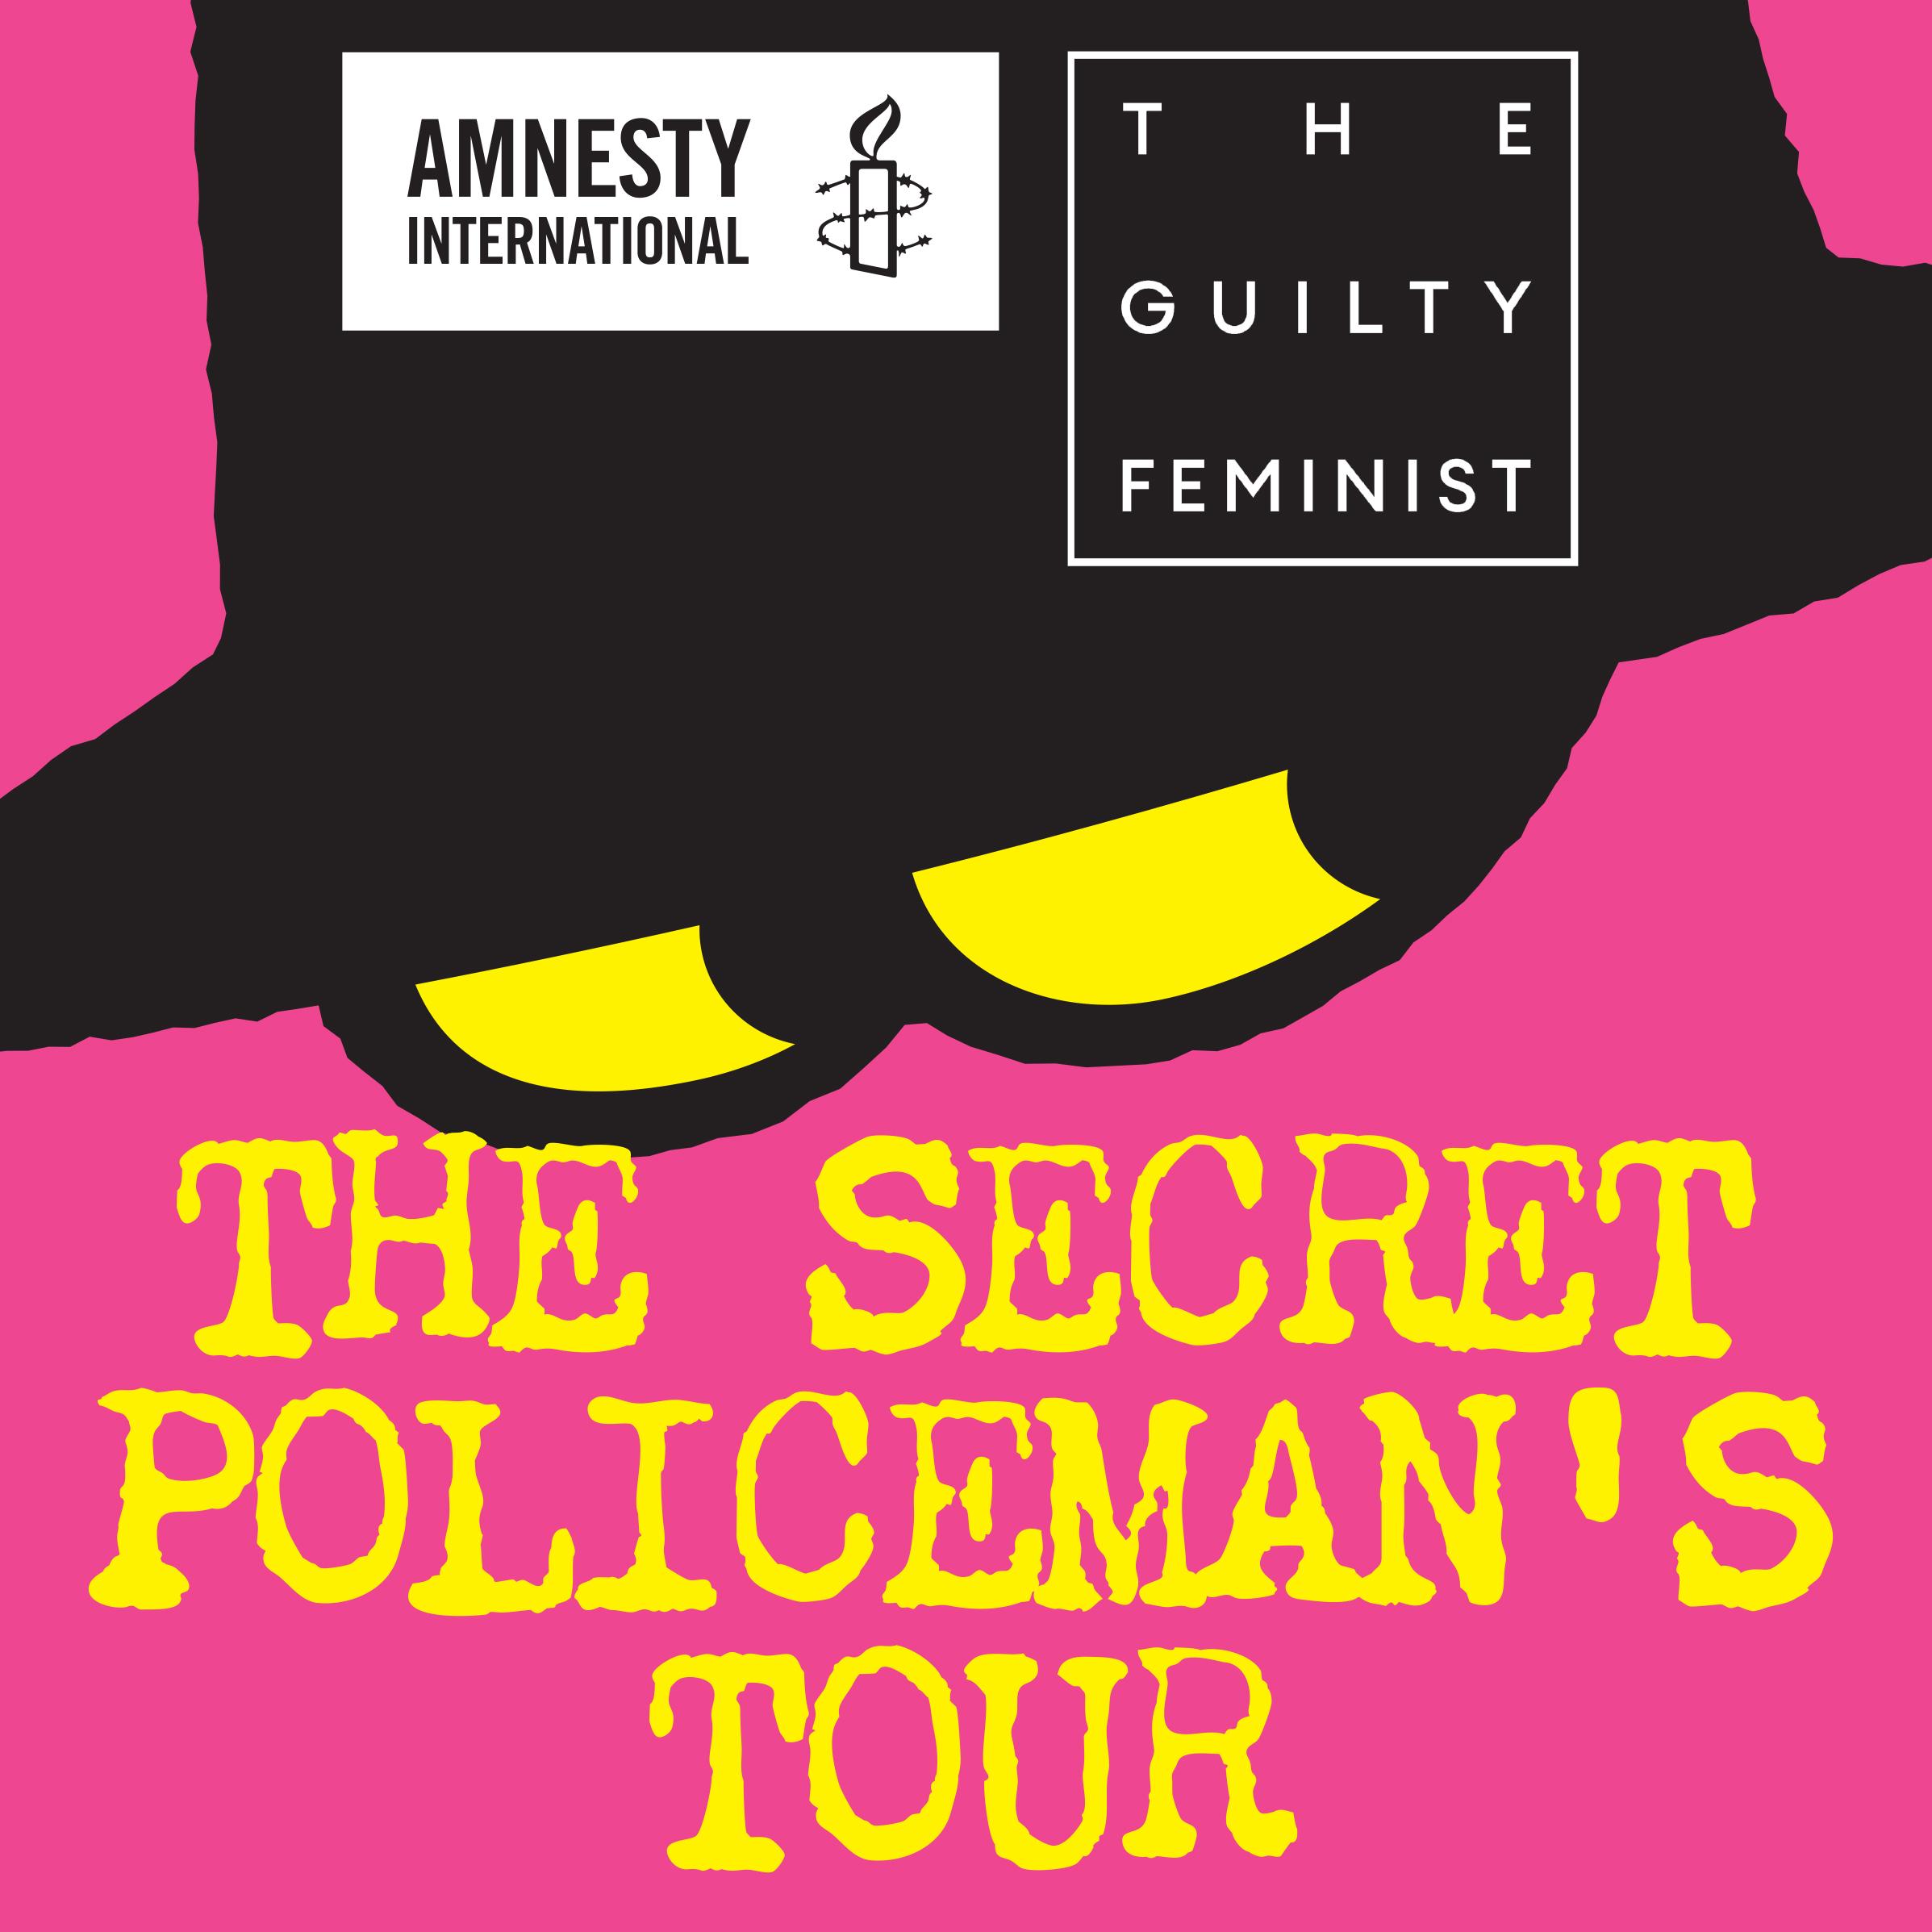 Artwork for The Secret Policeman's Tour - Edinburgh 2019